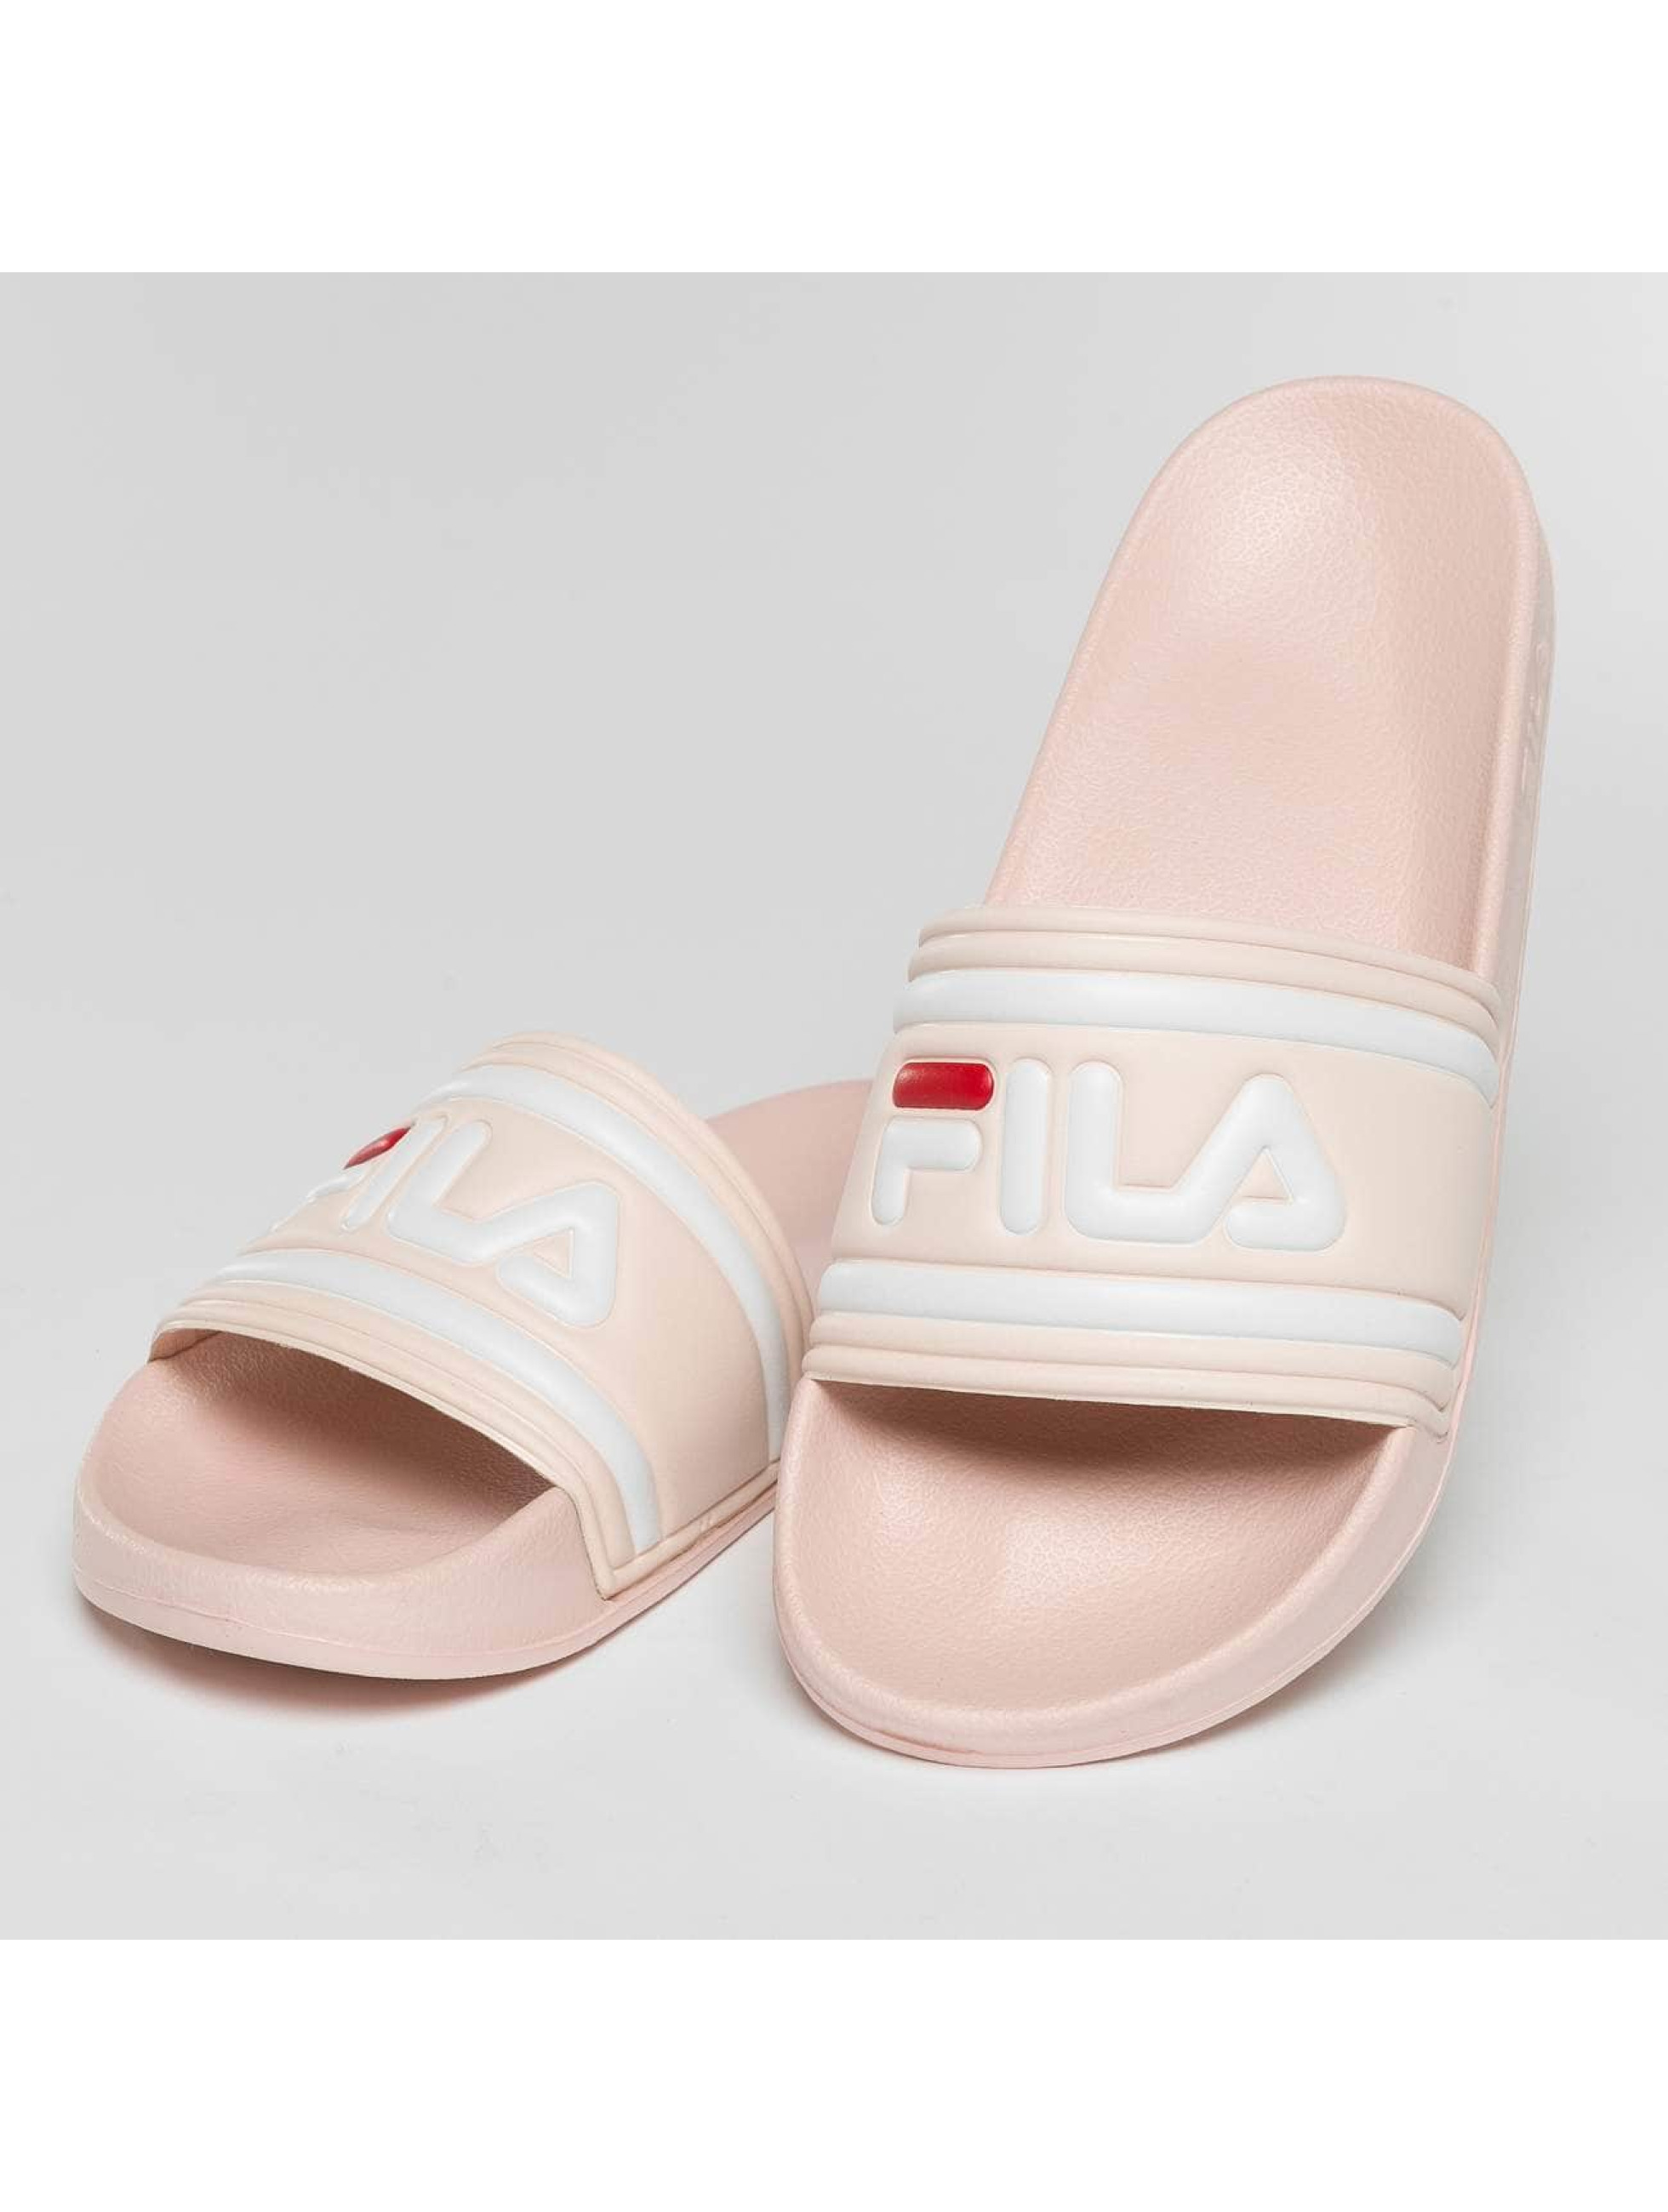 FILA Sandals Base Morro Bay Slippers rose